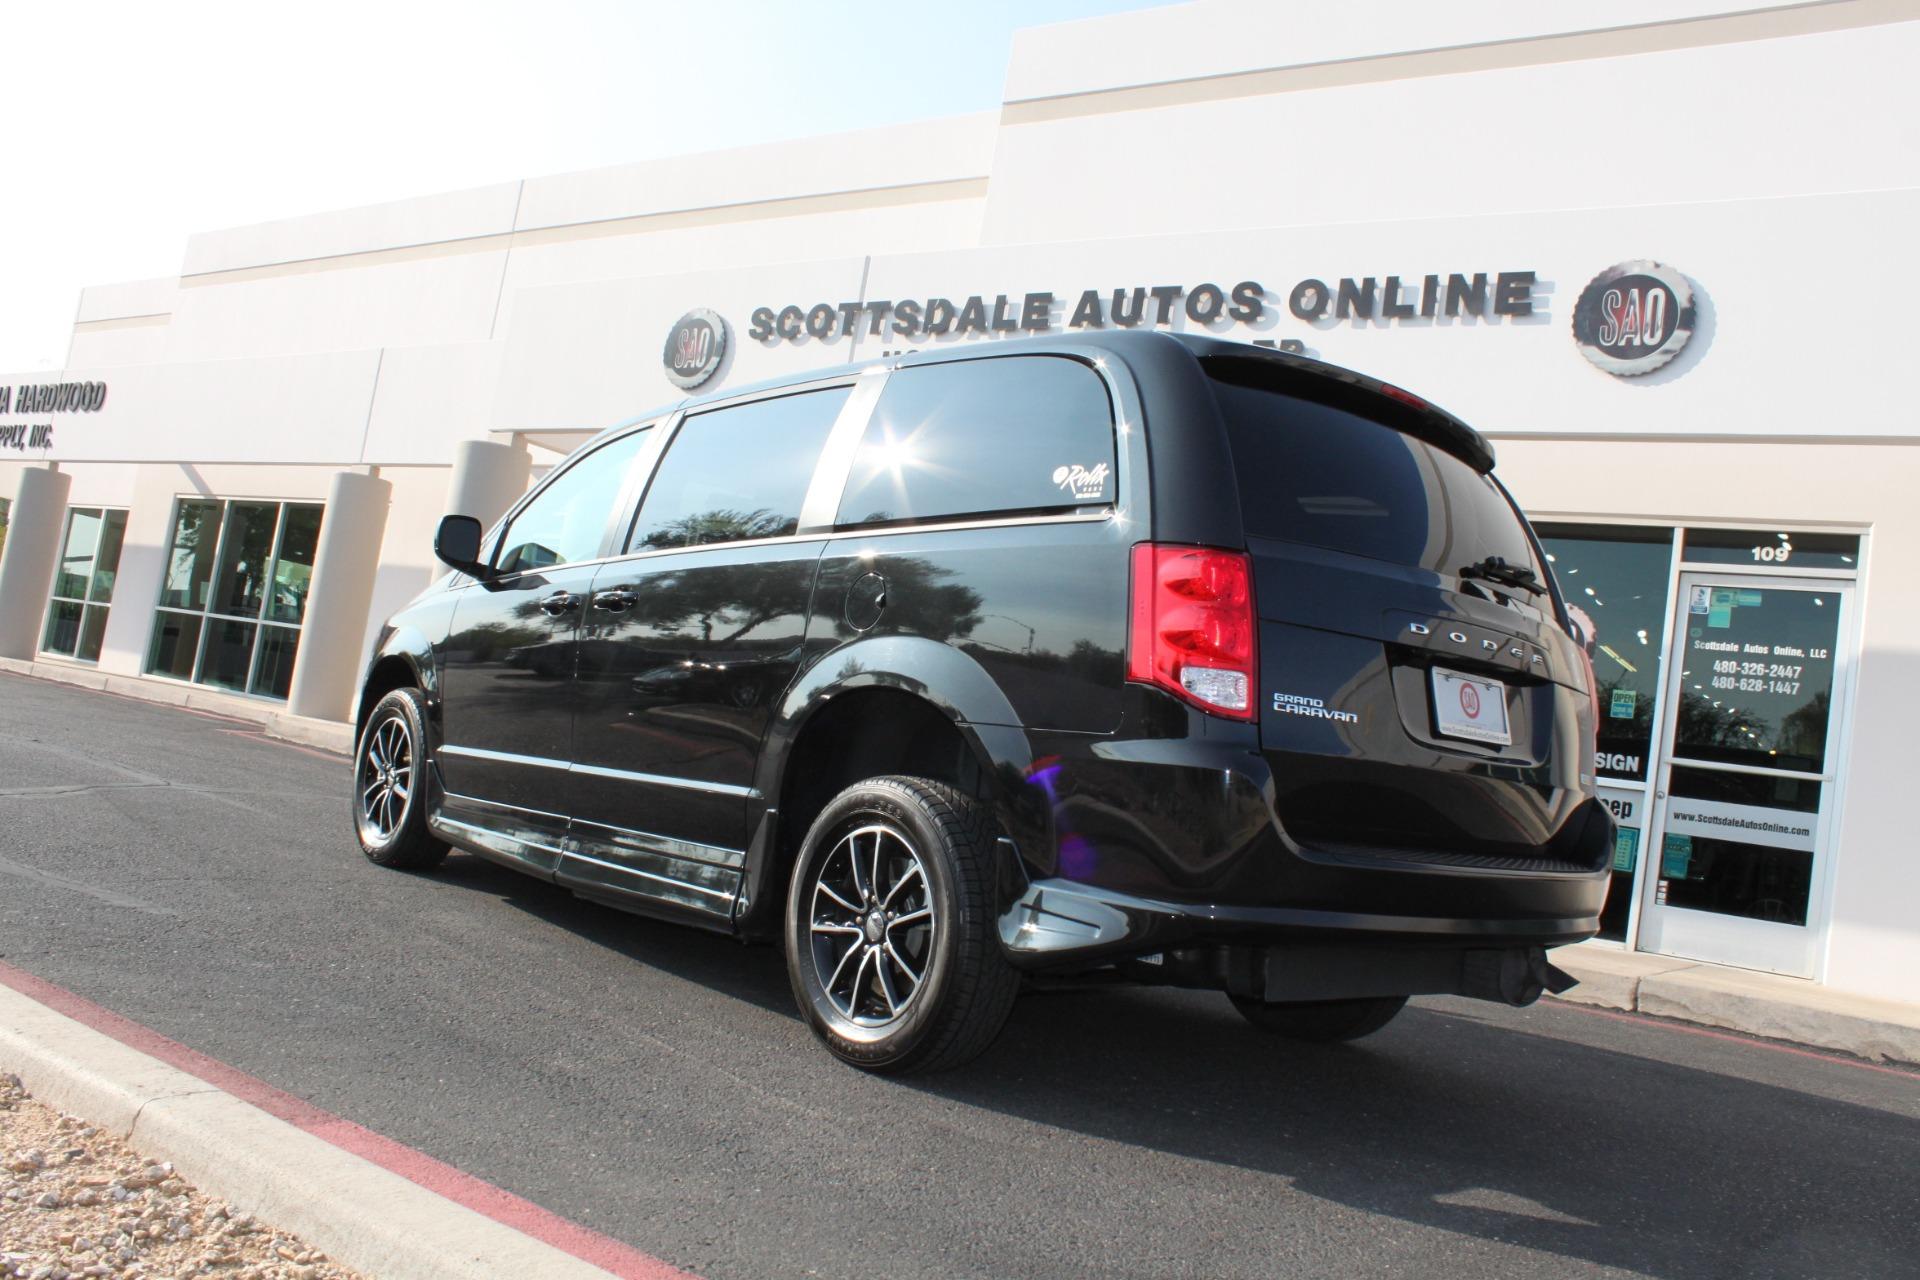 Used-2018-Dodge-Grand-Caravan-SXT-Rollx-Mobility-Conversion-Chevrolet